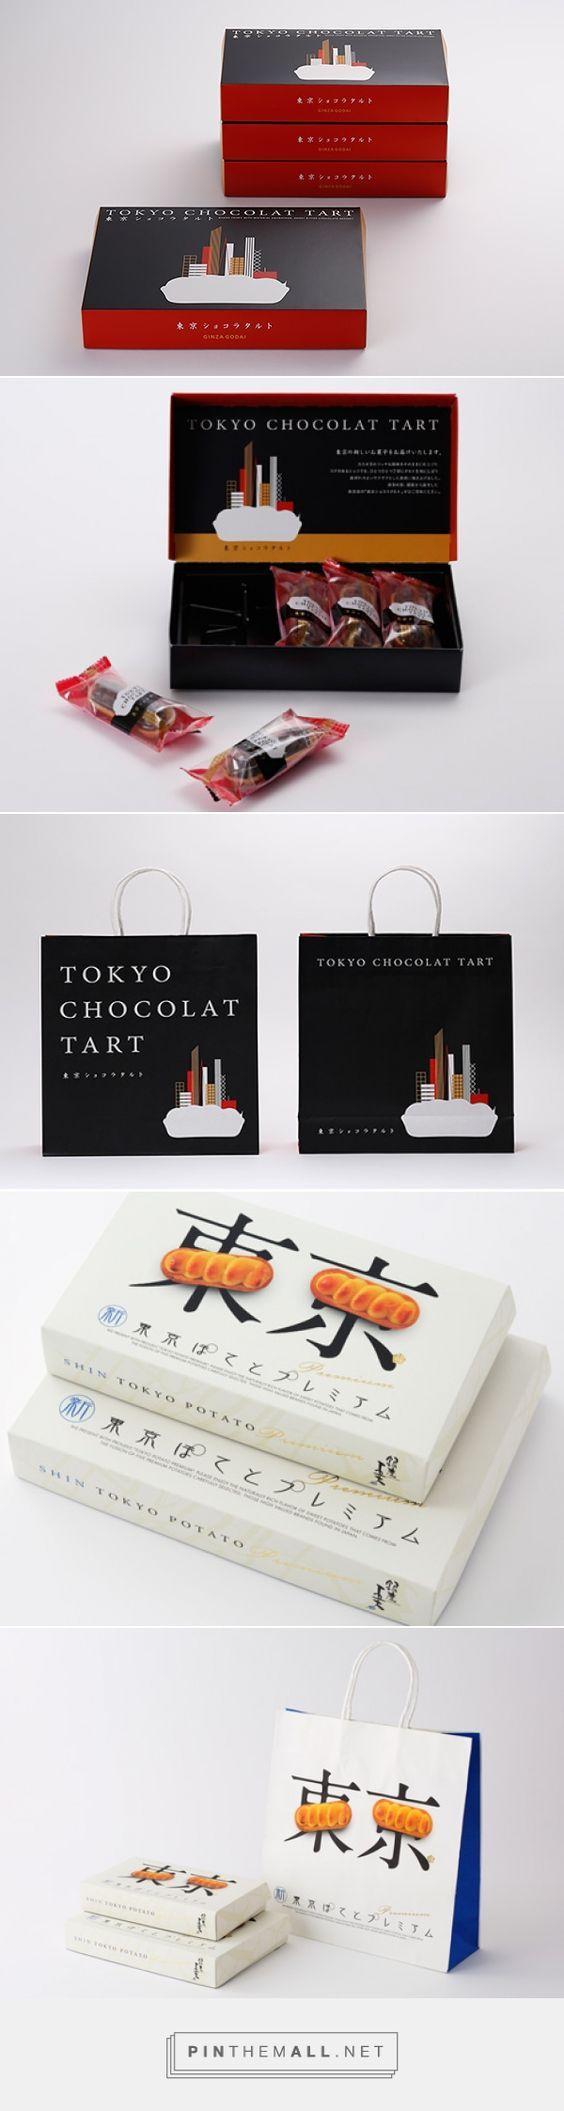 GINZA GODAI | WORKS | AWATSUJI design - created via https://pinthemall.net: